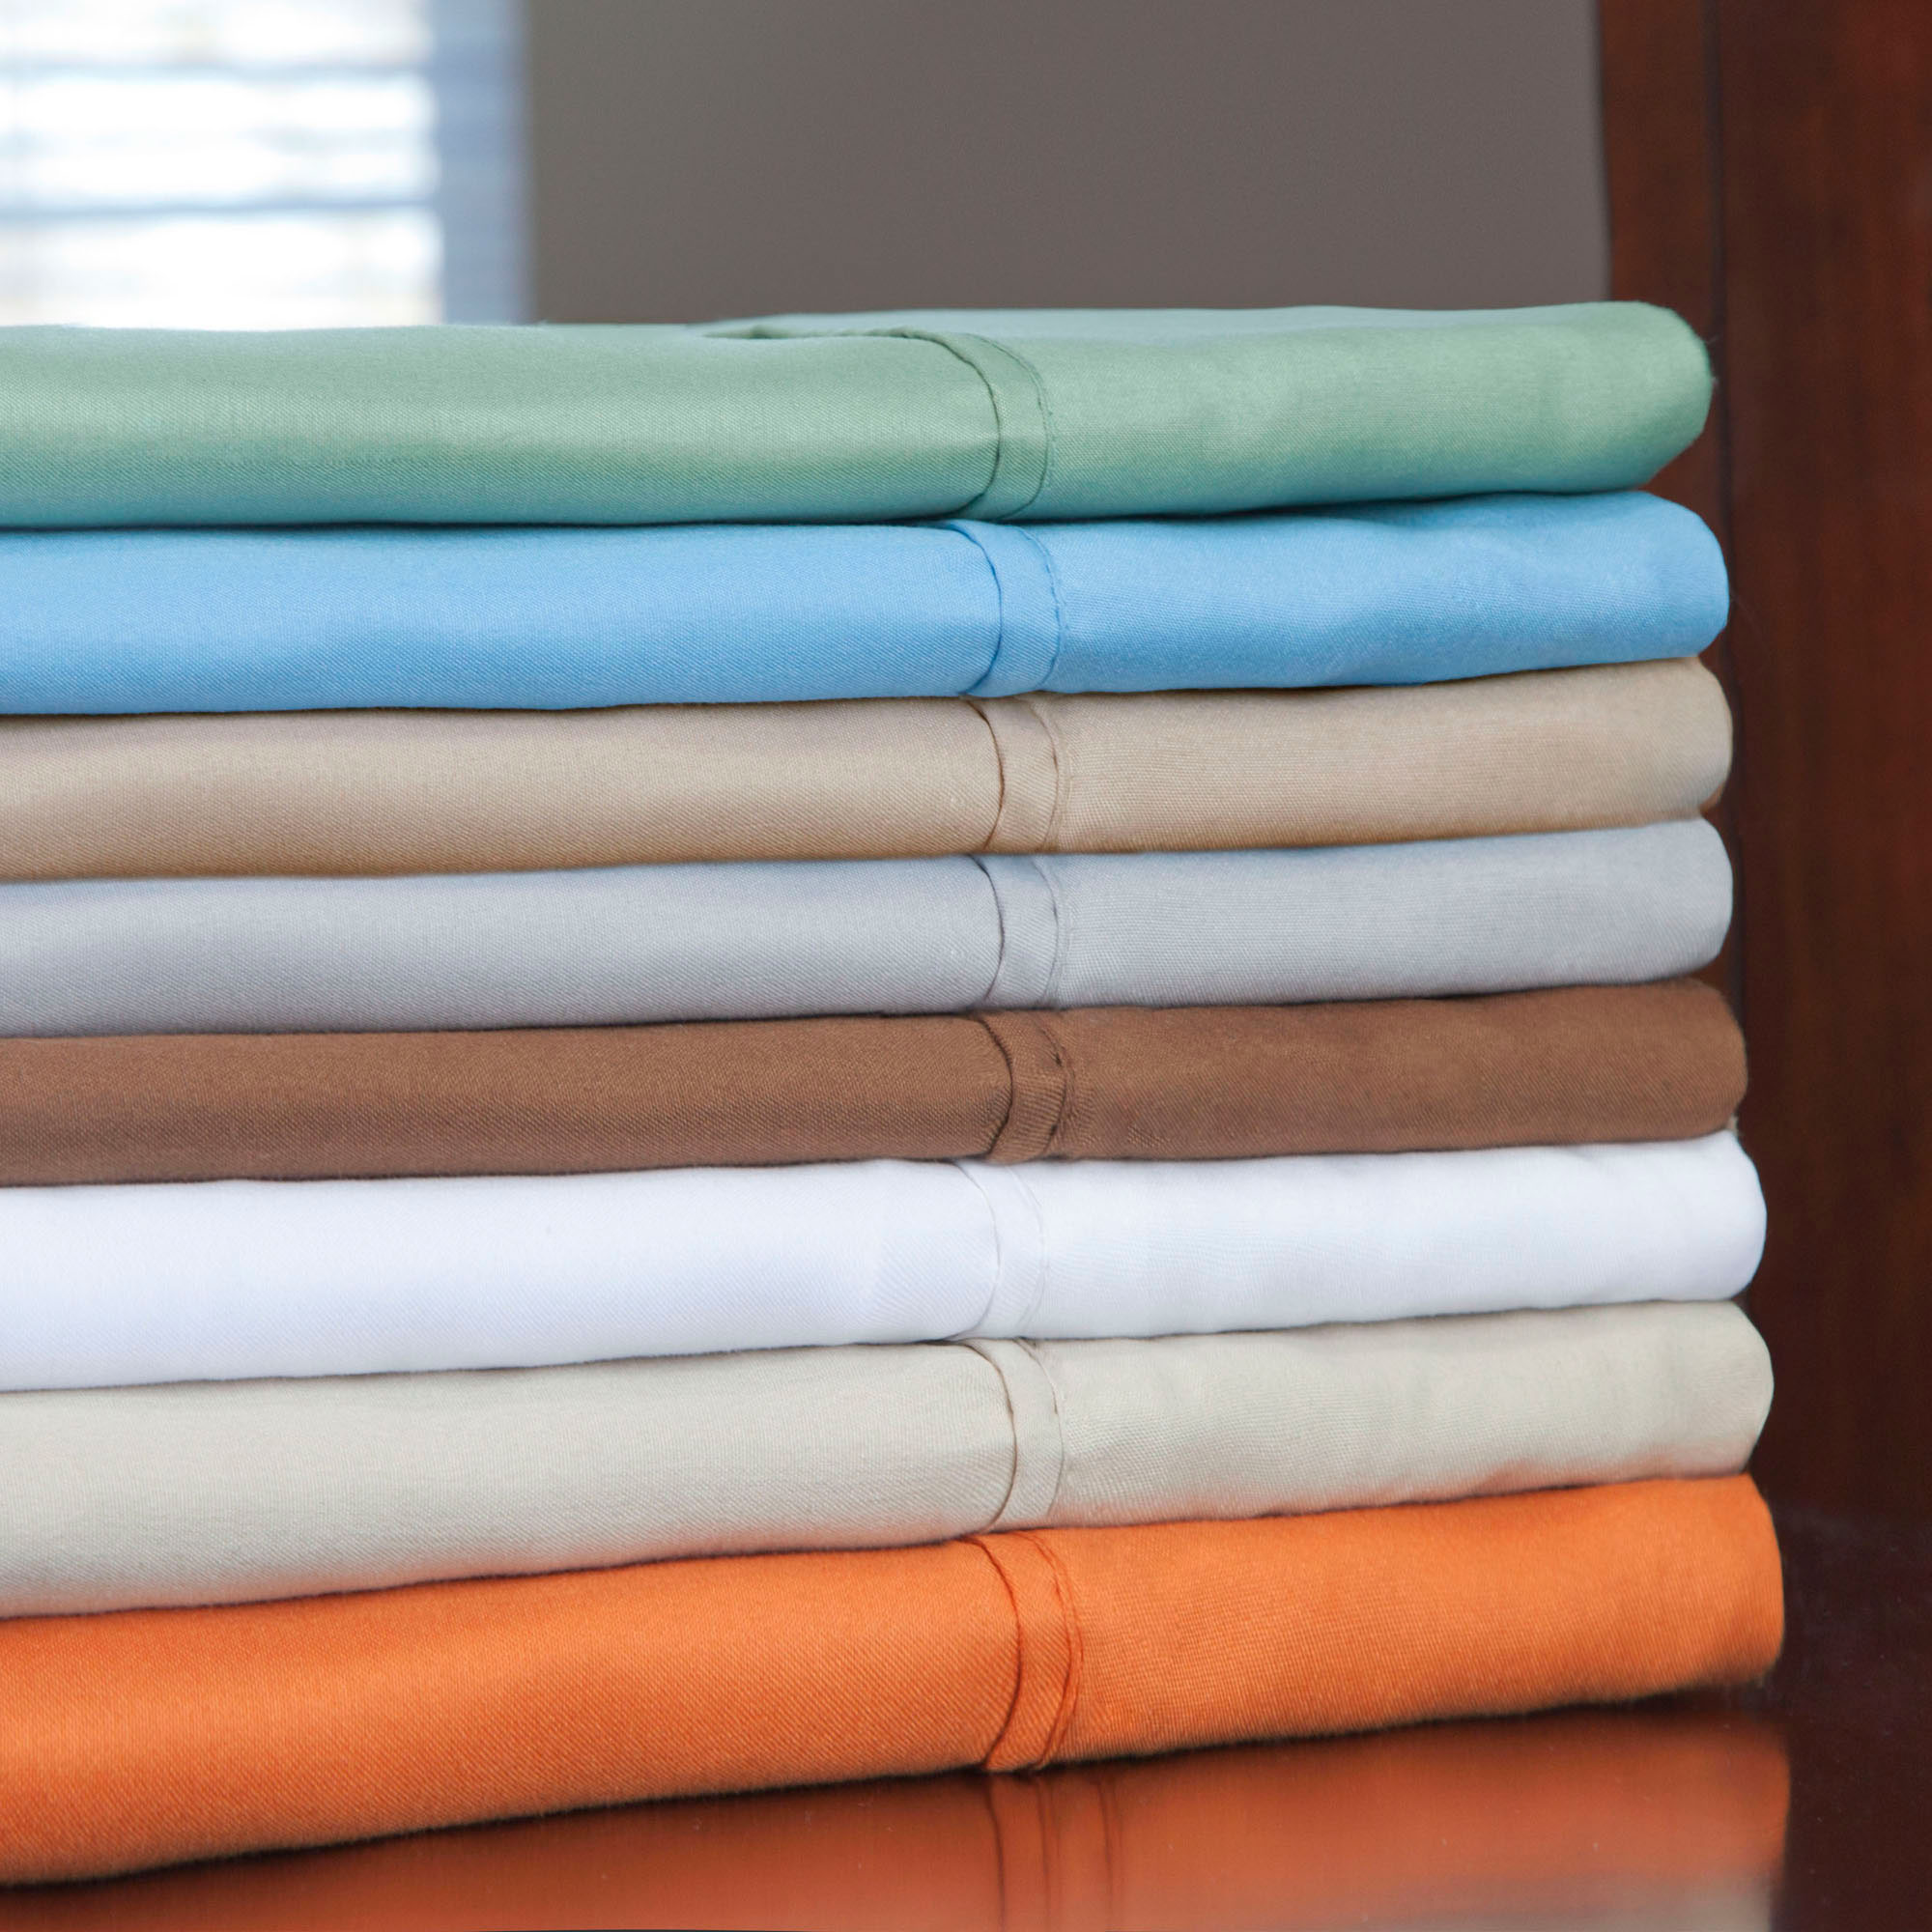 Carolines Treasures Hummingbird Combat Fabric Standard Pillowcase 8968PILLOWCASE Multicolor